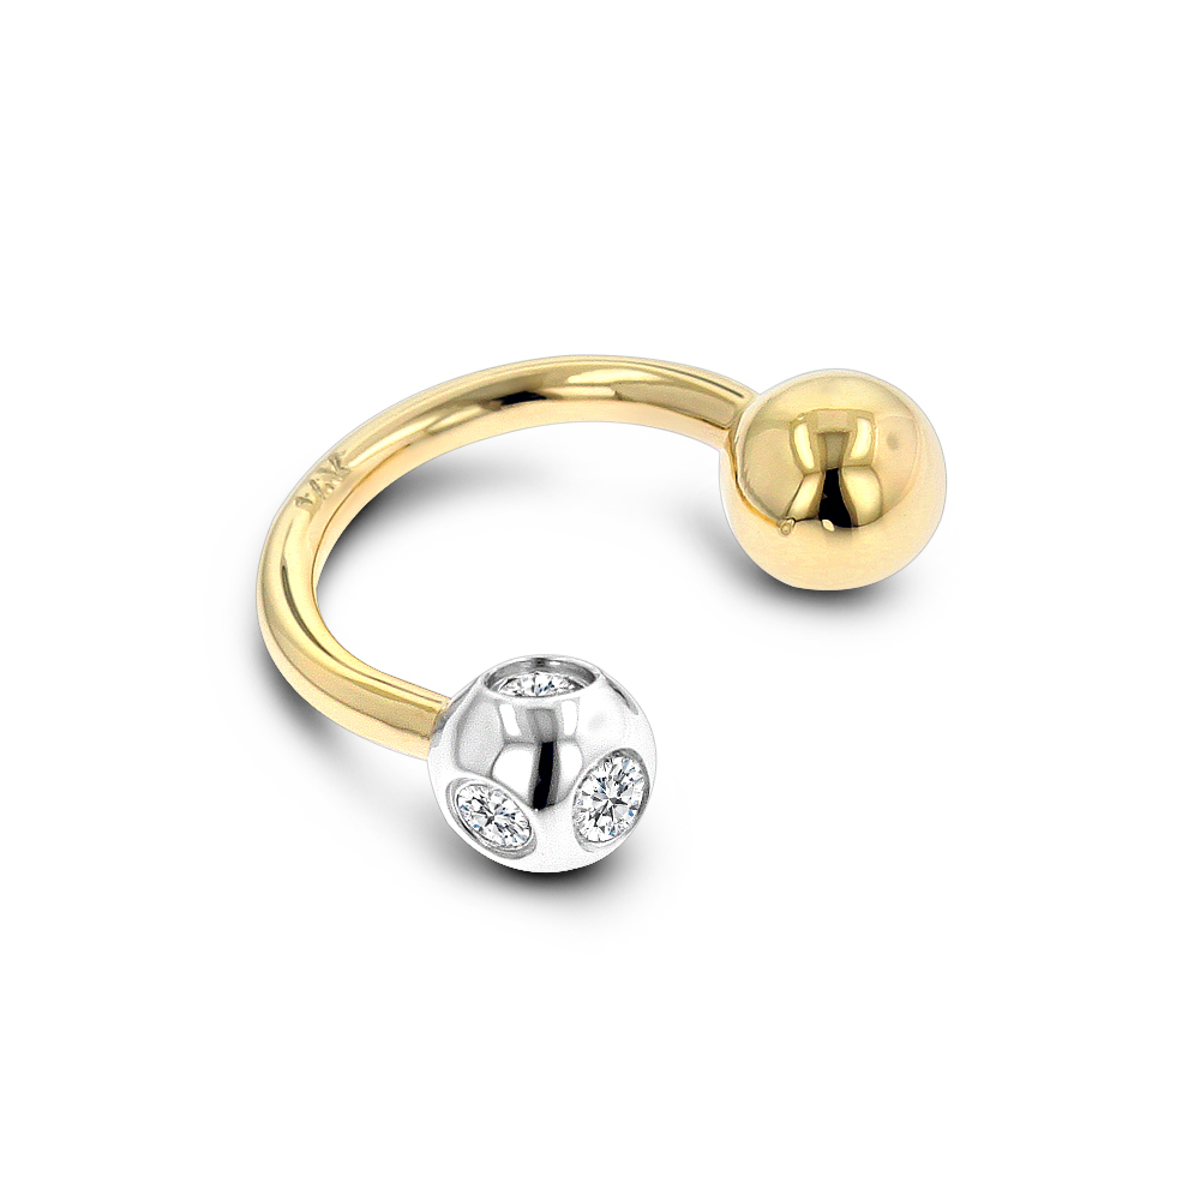 14K Solid Gold Real Diamond Body Jewelry Piece 0.15ct